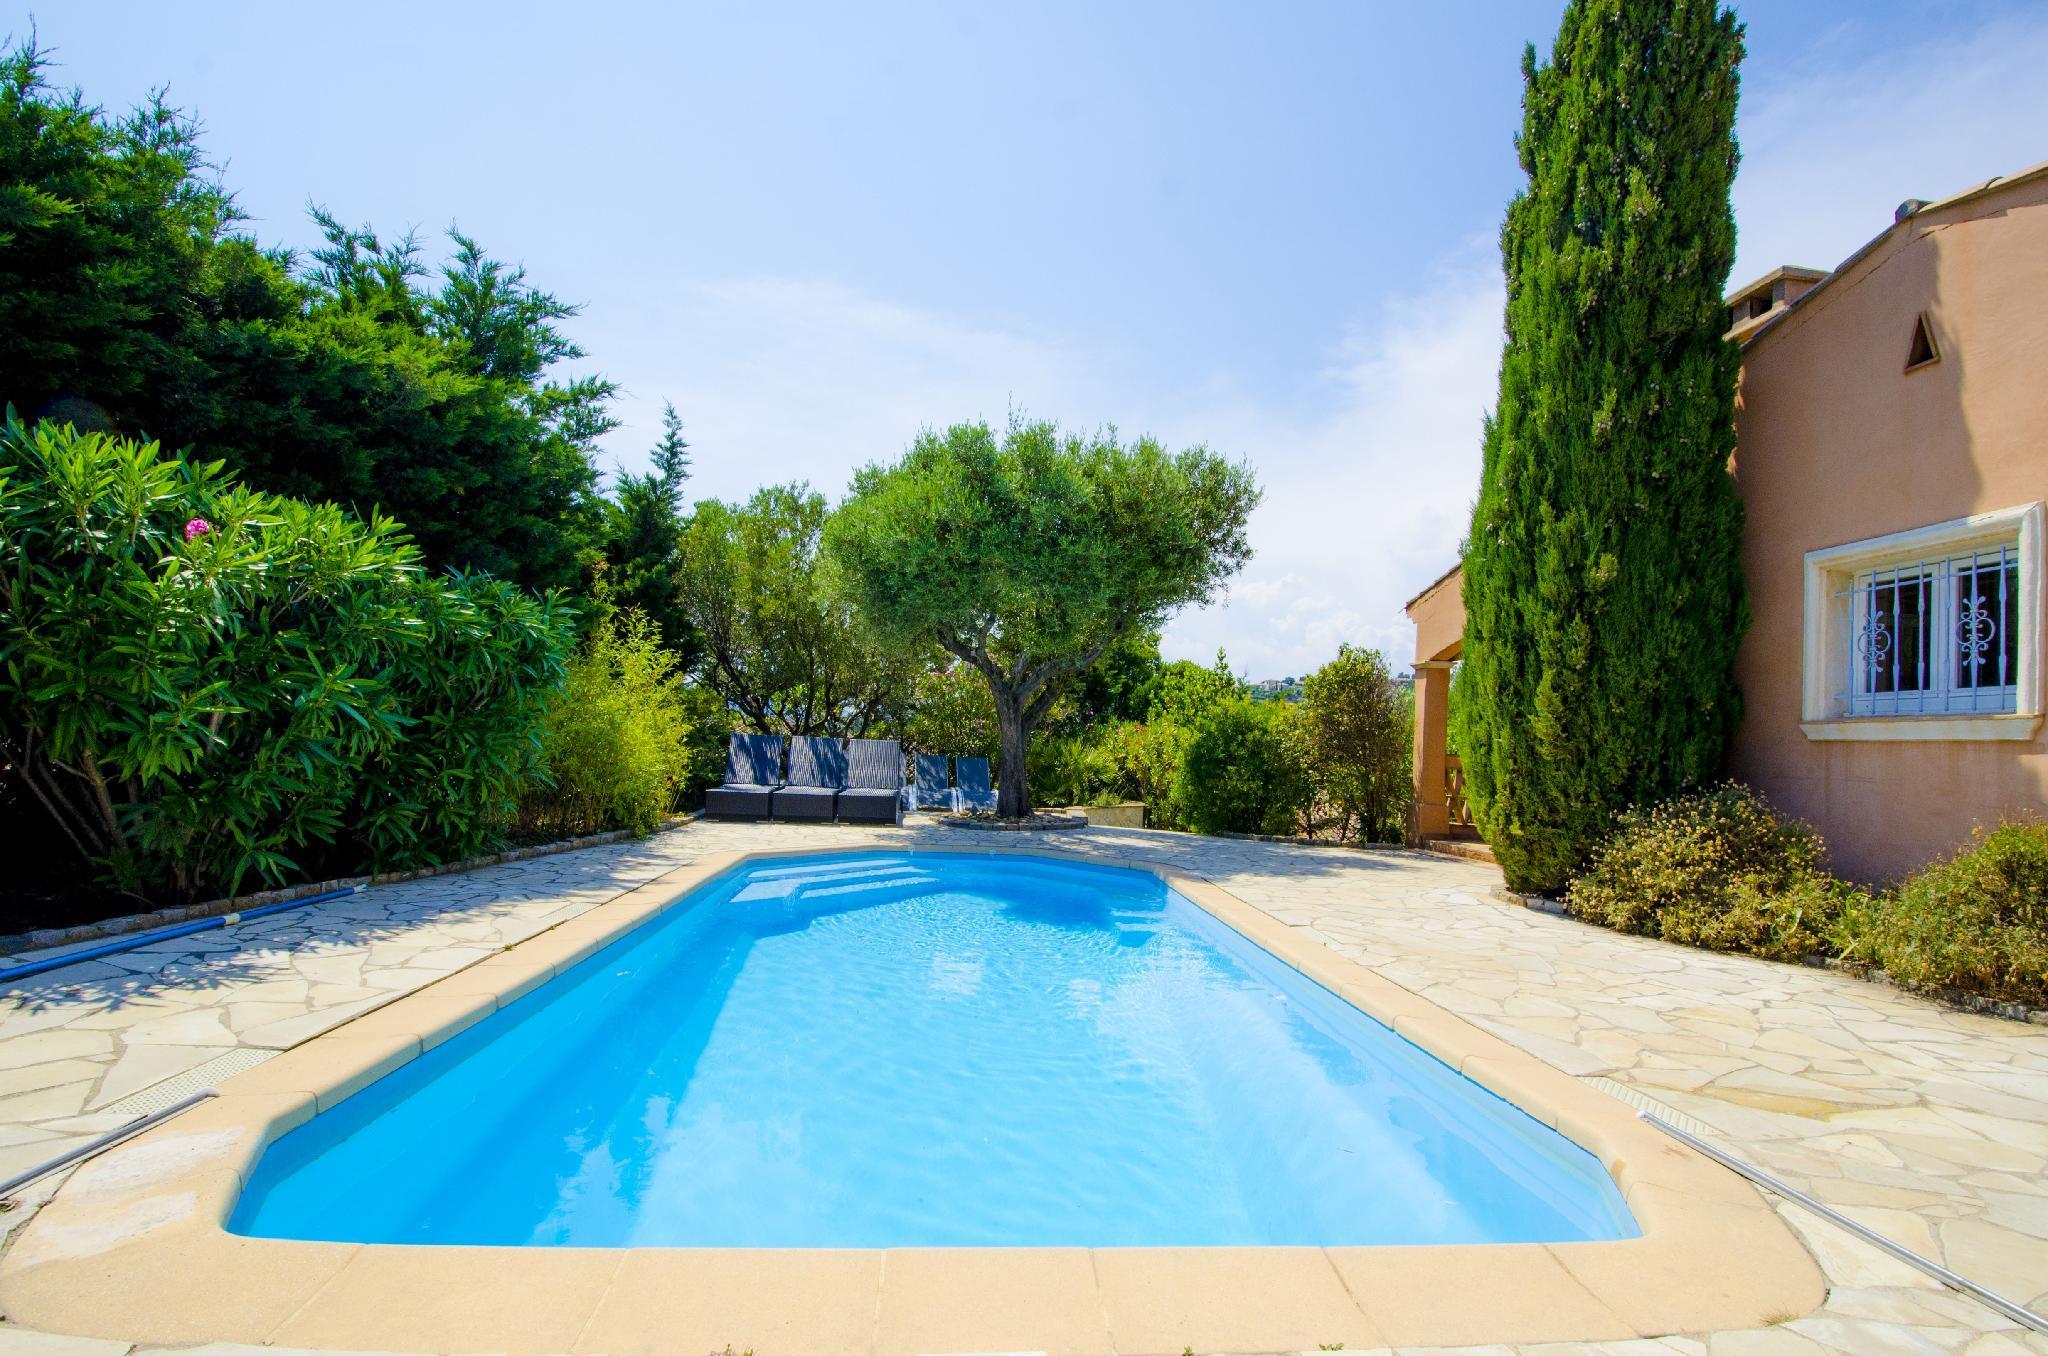 Villa Private Heated Pool   Gulf Saint Tropez